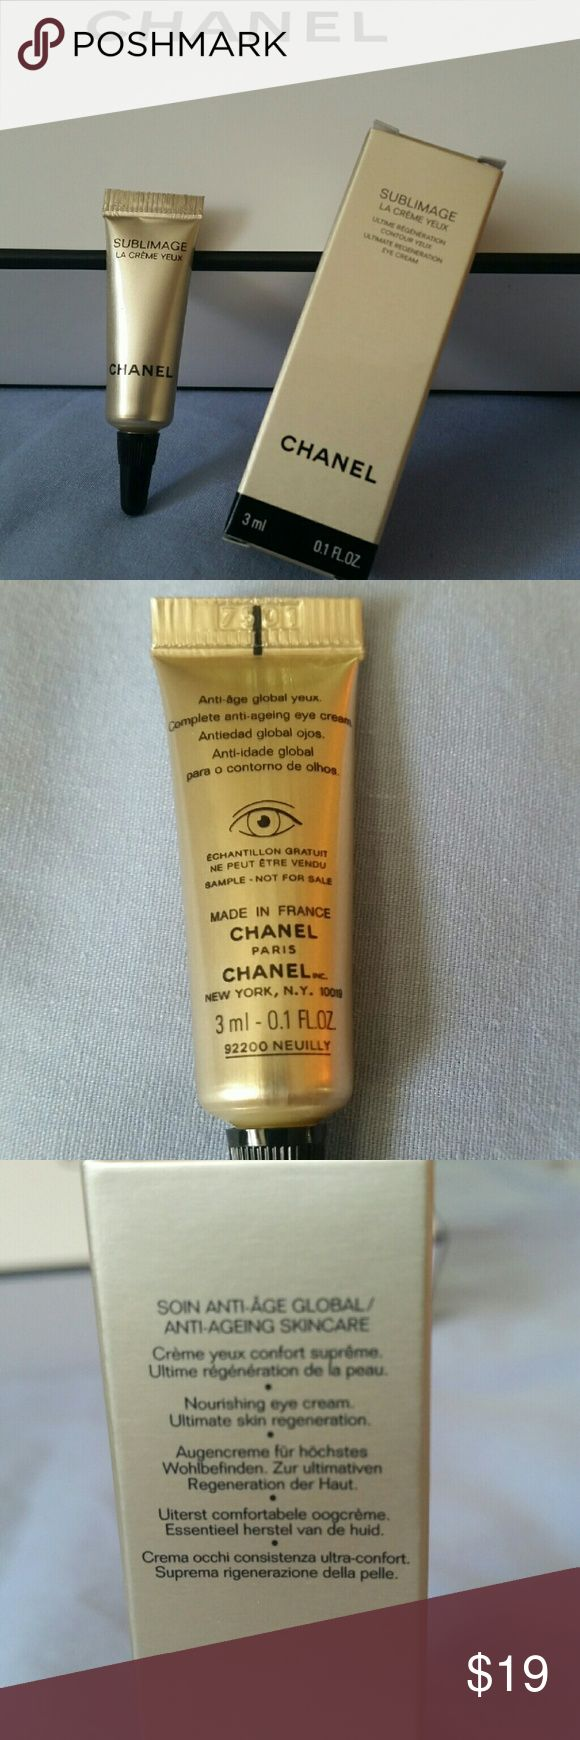 CHANEL Sublimage La Creme Yeux Eye Cream CHANEL Sublimage La Creme Yeux Eye Cream Complete anti-aging eye cream; nourishing eye cream. Ultimate skin regeneration. Brand new - never opened. 3ml - 0.1 FL.OZ ($45 value) Chanel Makeup Eye Primer